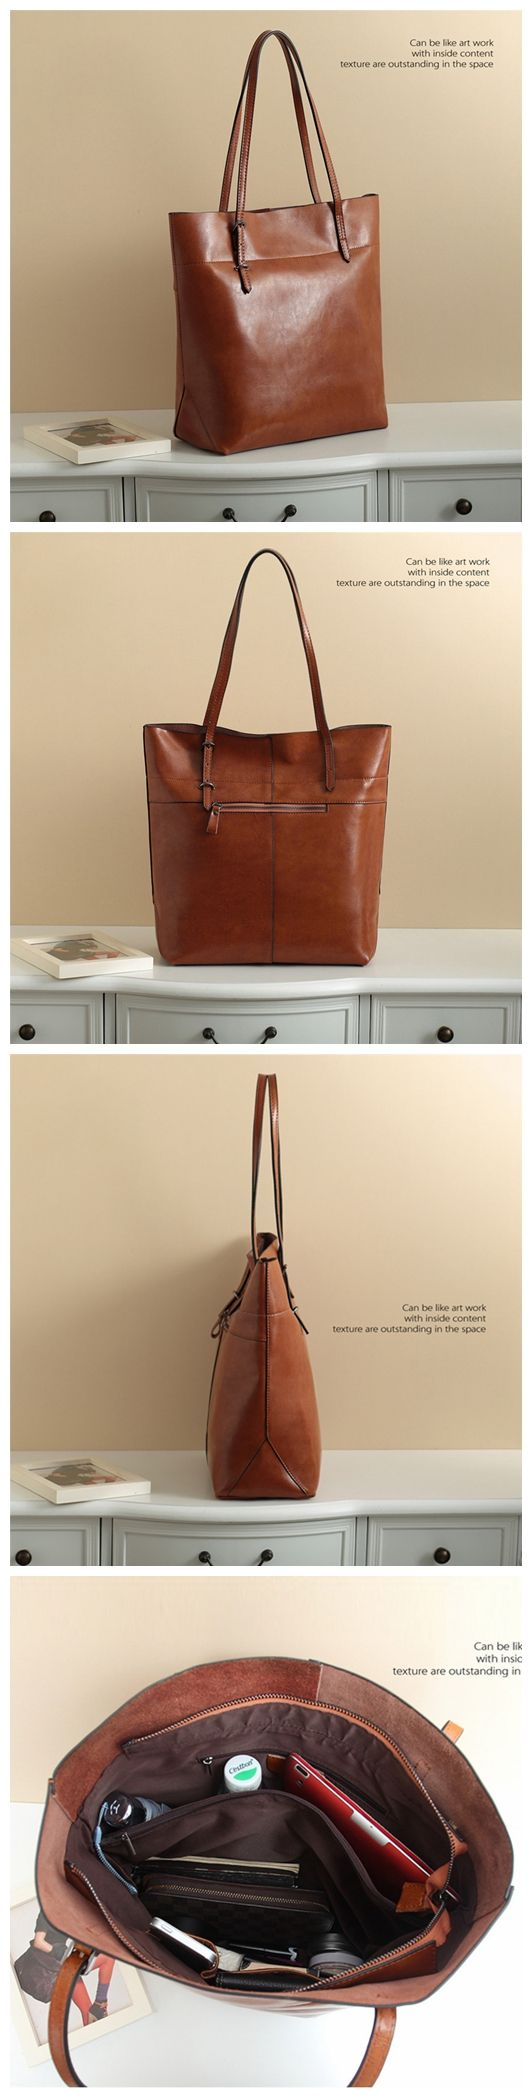 Handmade Genuine Leather Women's Fashion Tote Handbag Shoulder Bag in Brown 14149